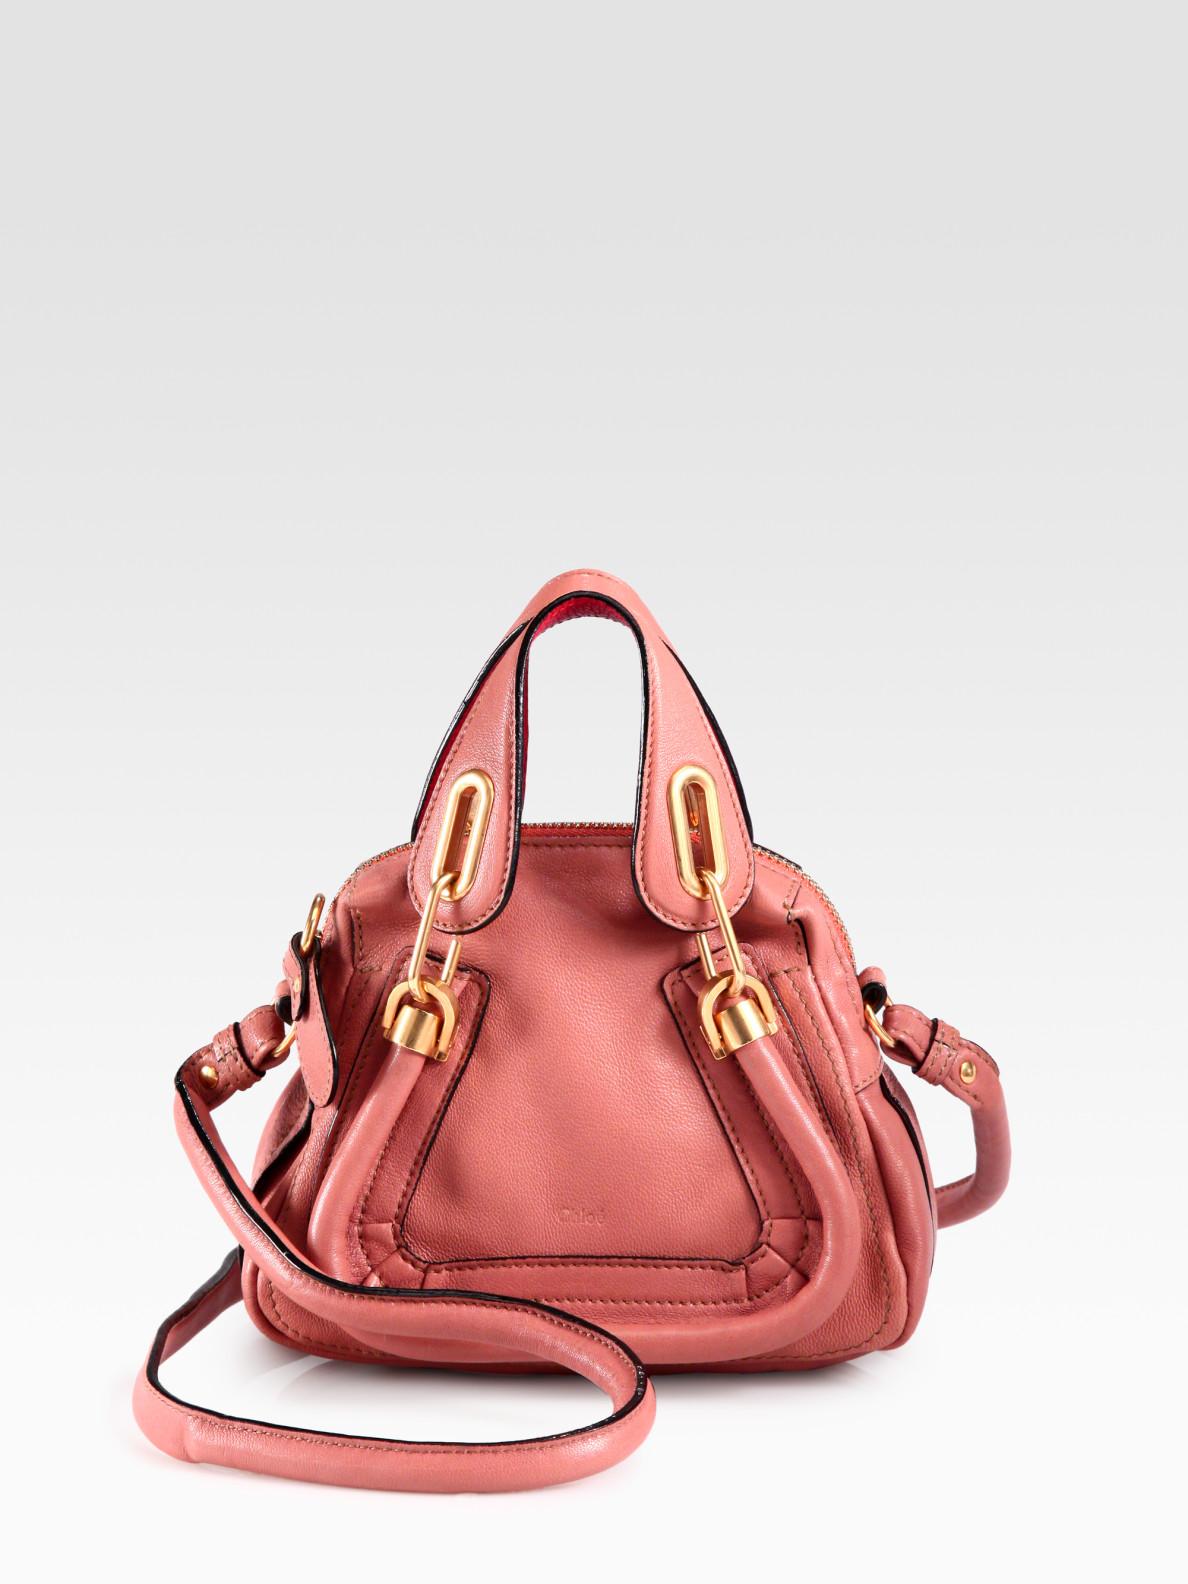 Chlo¨¦ Mini Leather Paraty Crossbody Bag in Pink | Lyst